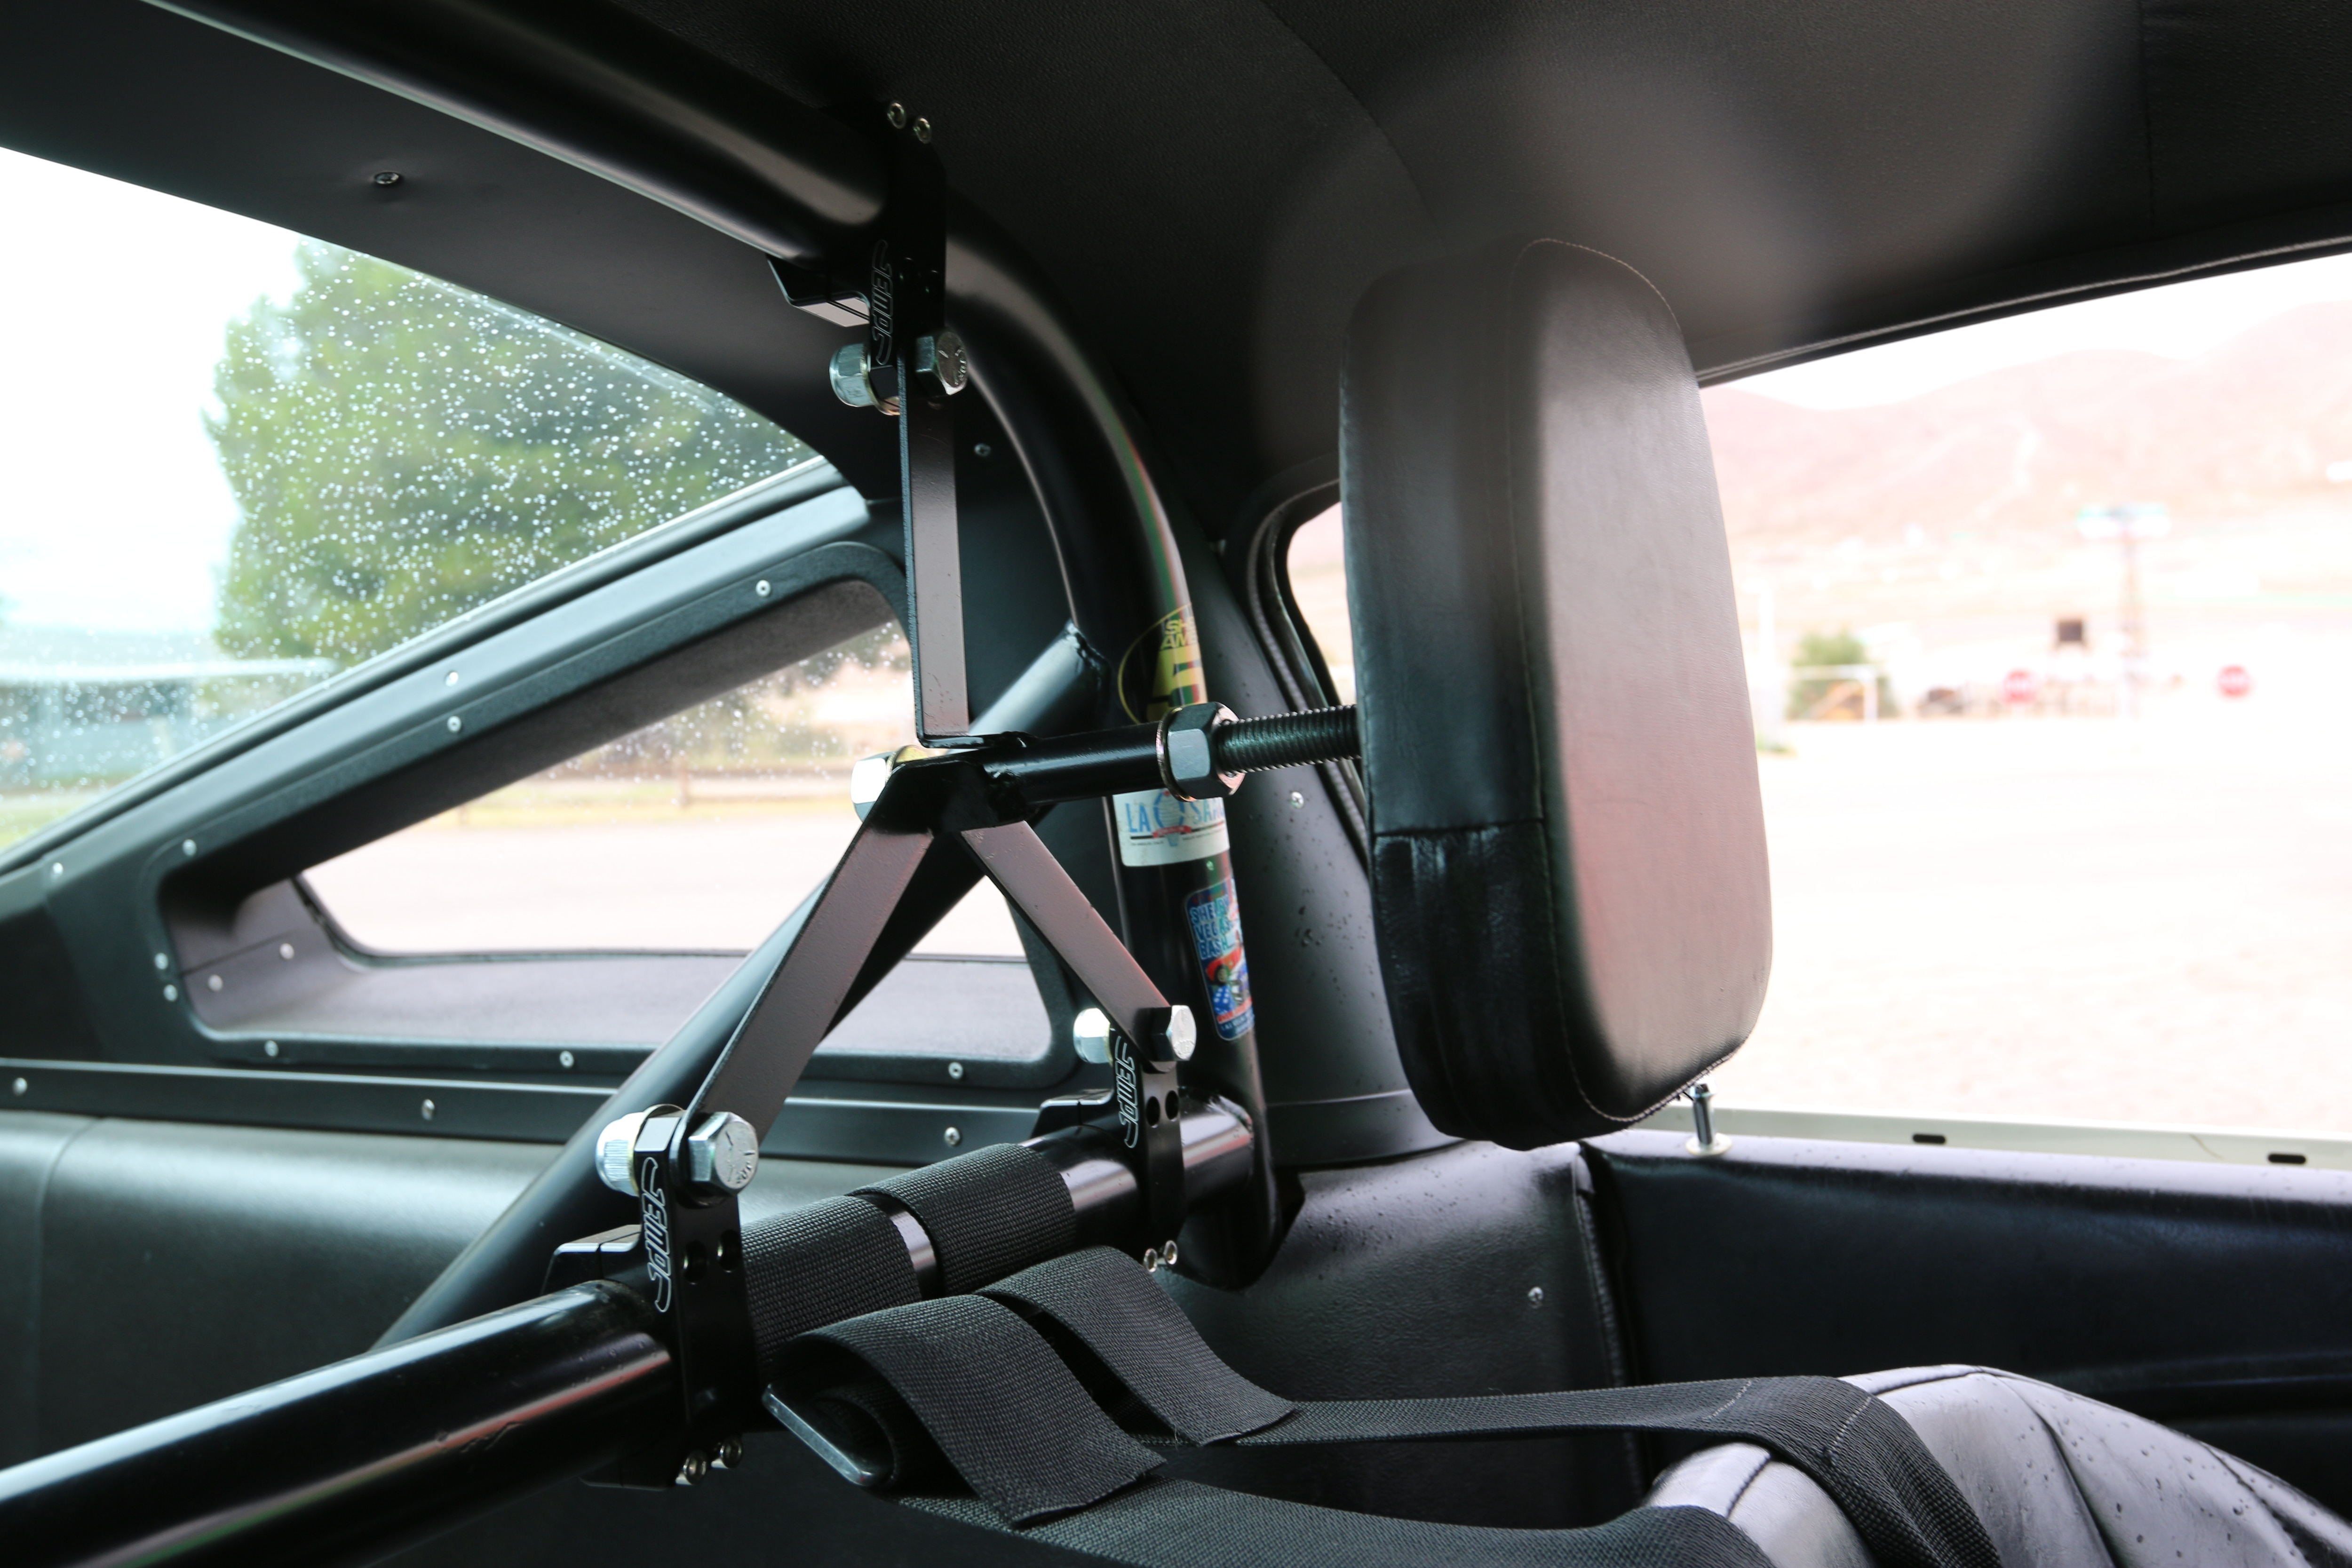 1966 Ford Mustang Rear Window